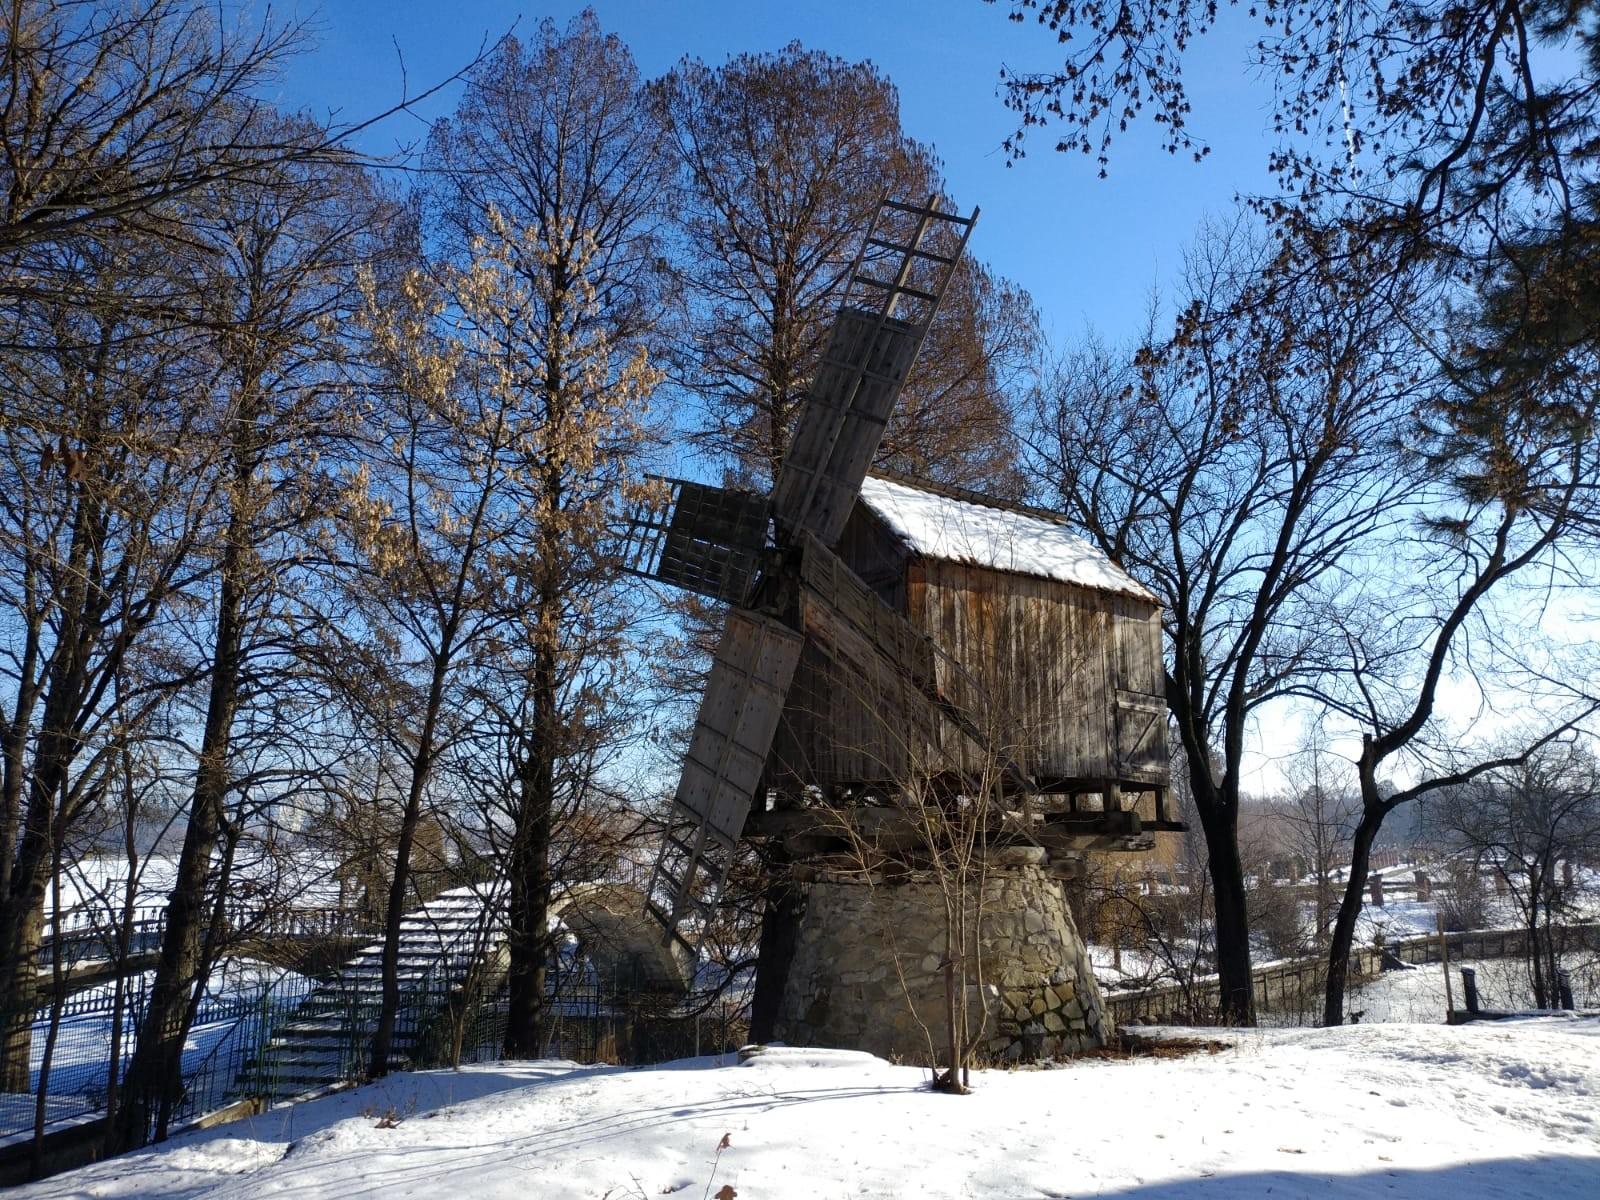 museo-villaggio-dimitrie-gusti-ffc918b20